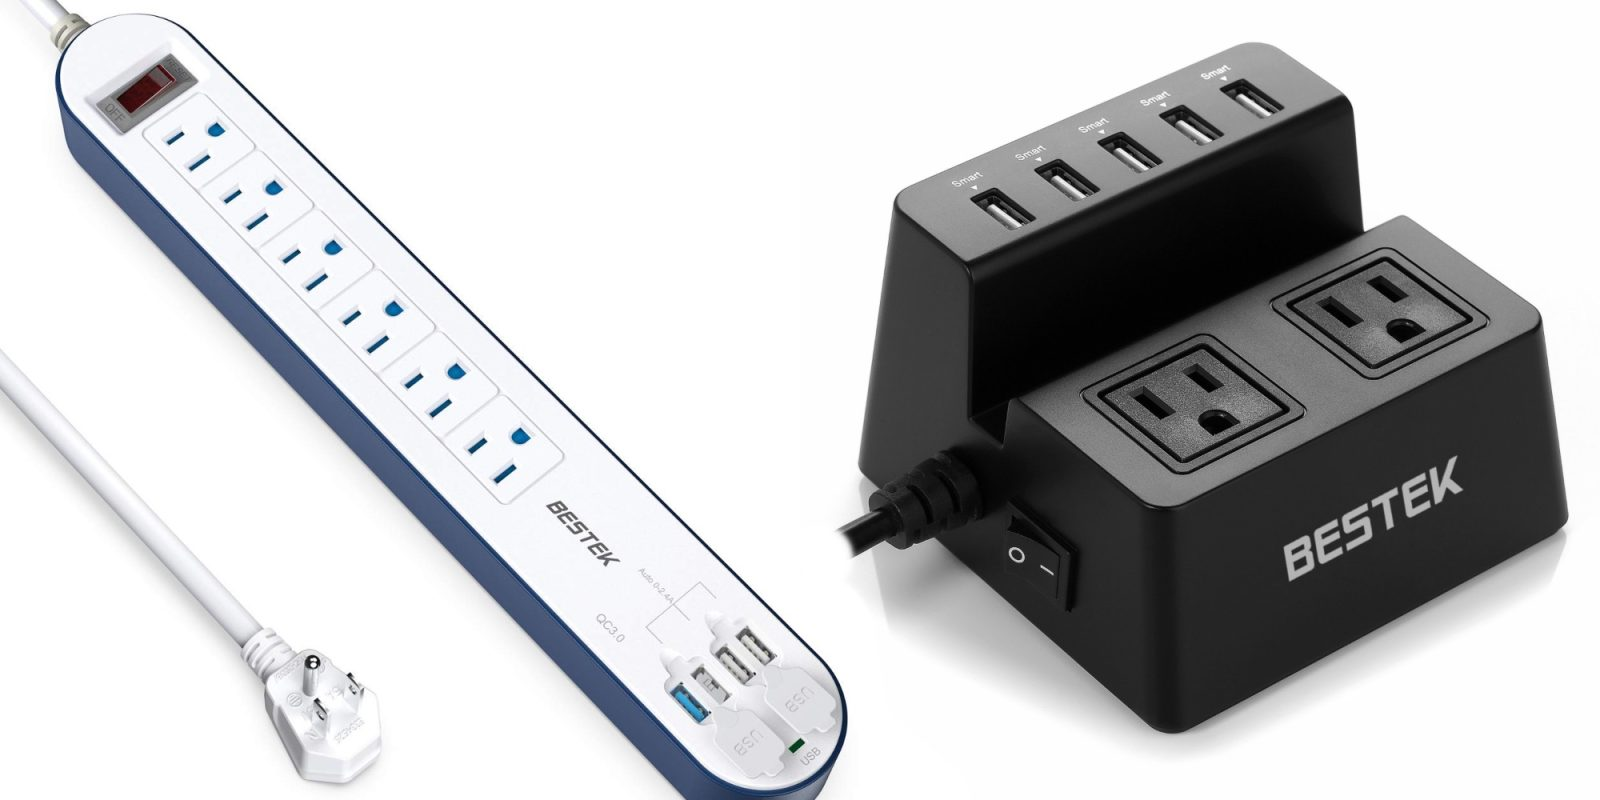 BESTEK's 40W Charging Station has 2 outlets + 4 USB ports: $20 (26% off), more